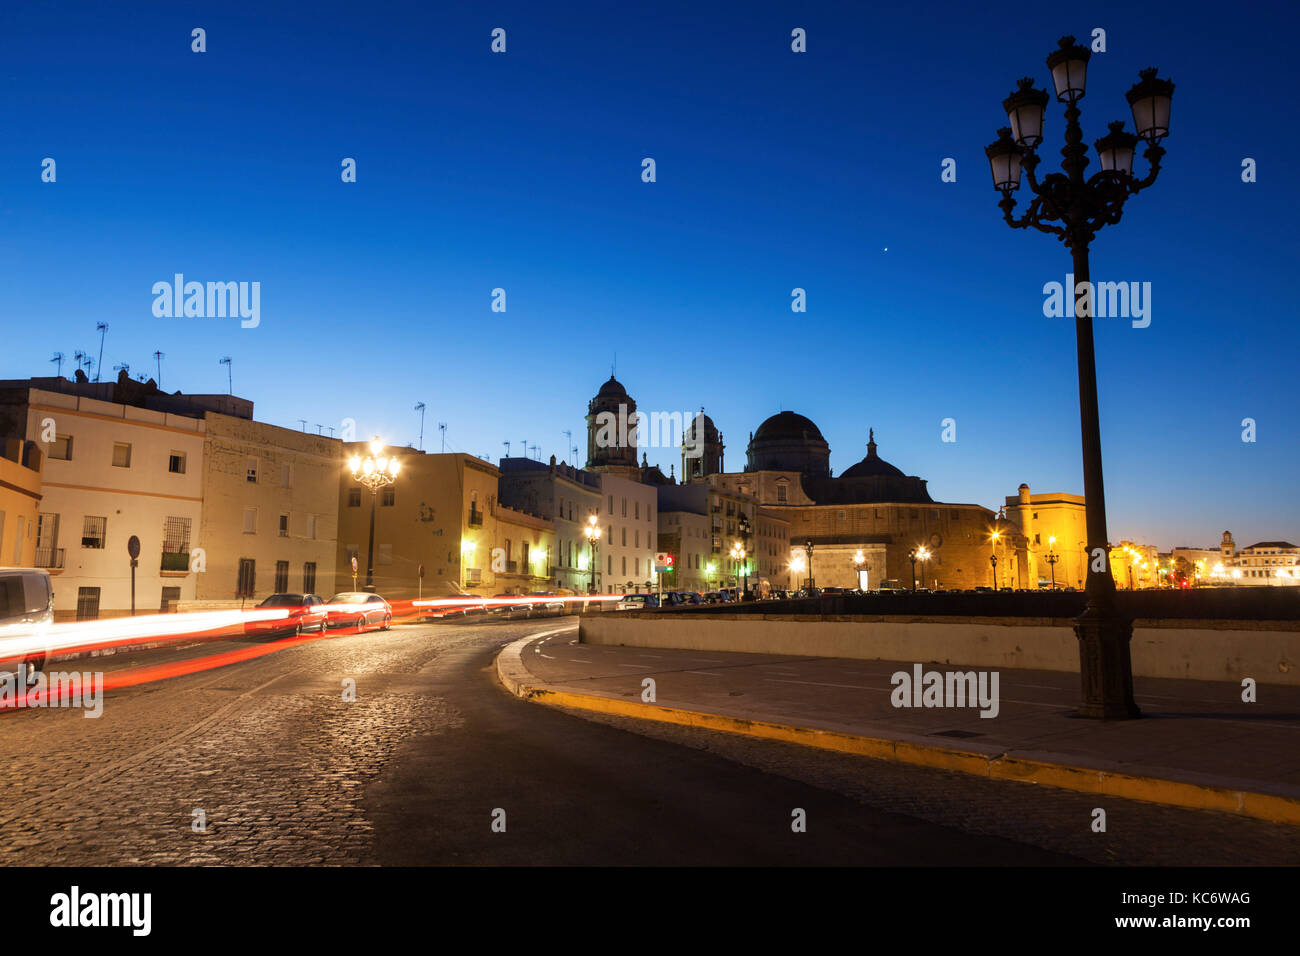 Spain, Andalusia, Cadiz, Cathedral de Cadiz in long exposure - Stock Image